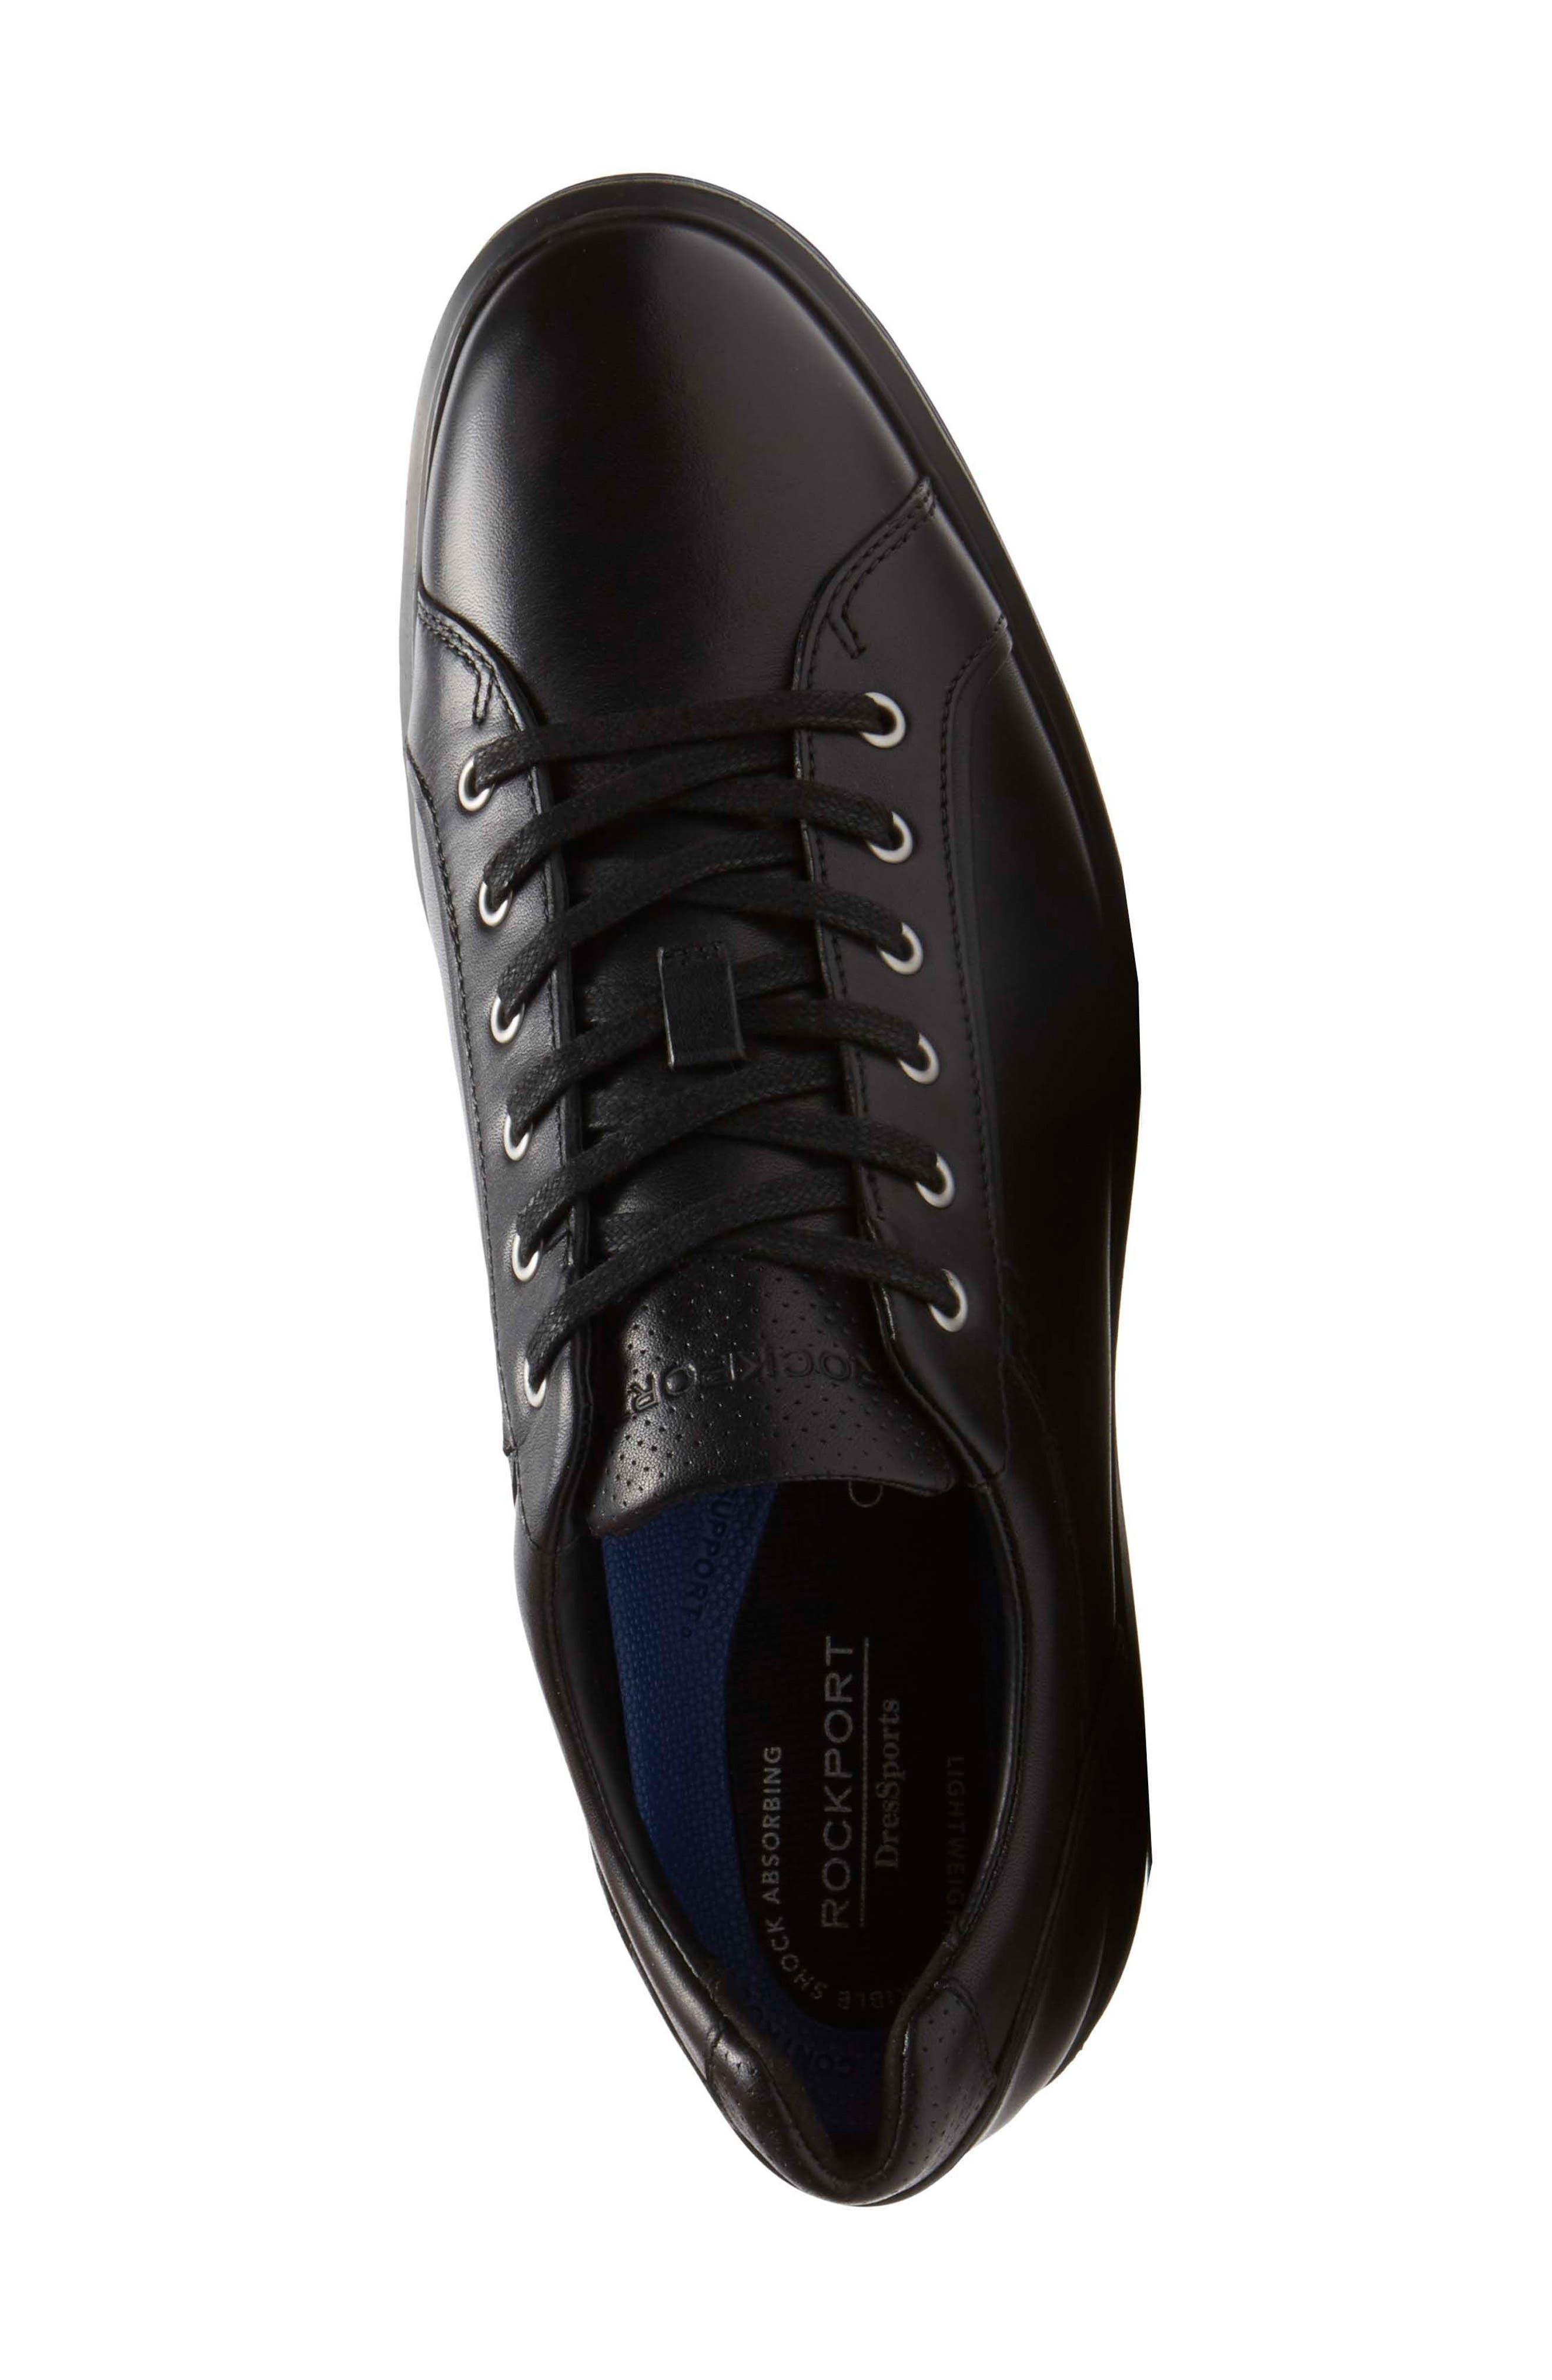 Dressports 2 Lite Plain Toe Derby,                             Alternate thumbnail 4, color,                             Black 2 Leather